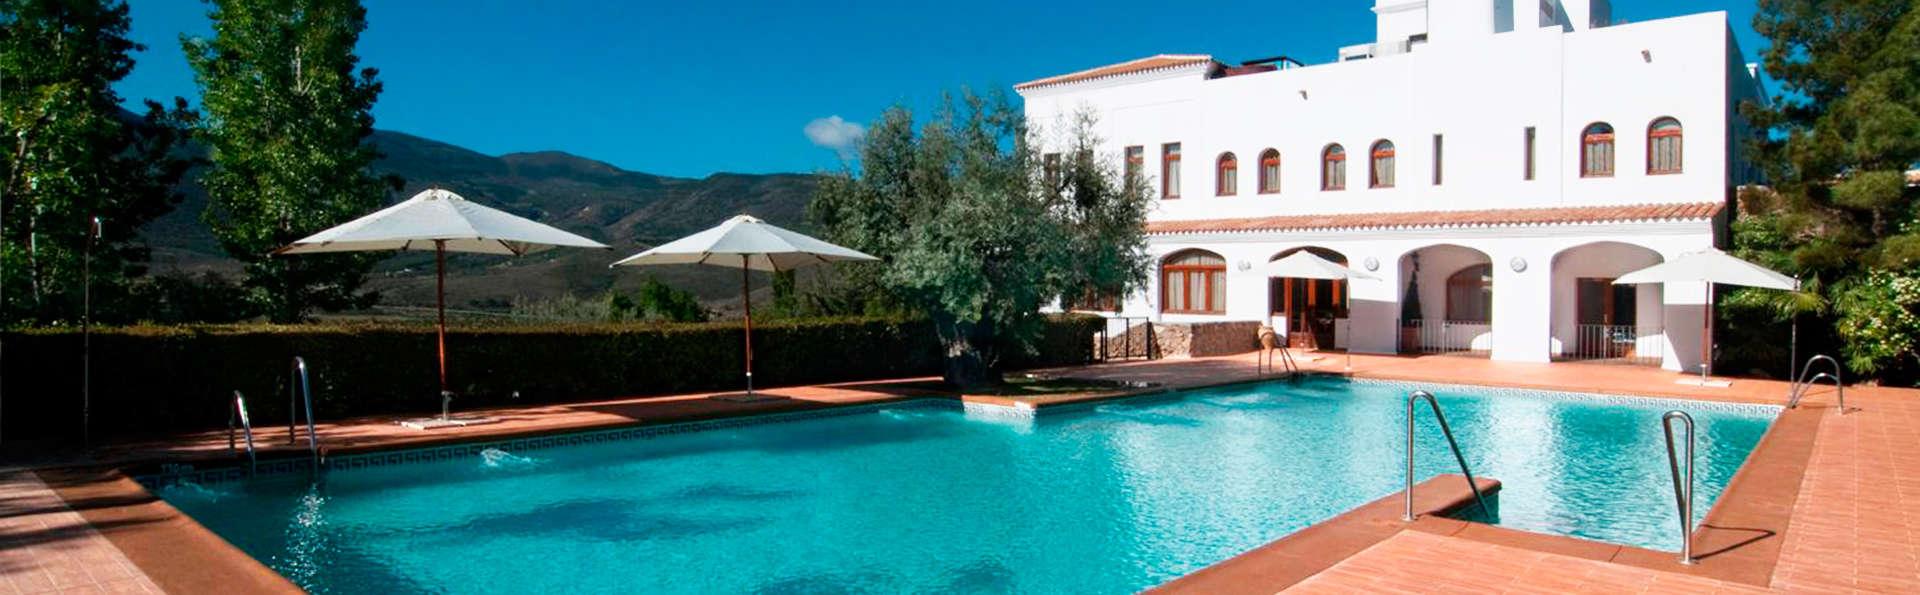 Villa Turística de Laujar de Andarax - EDIT_pool.jpg